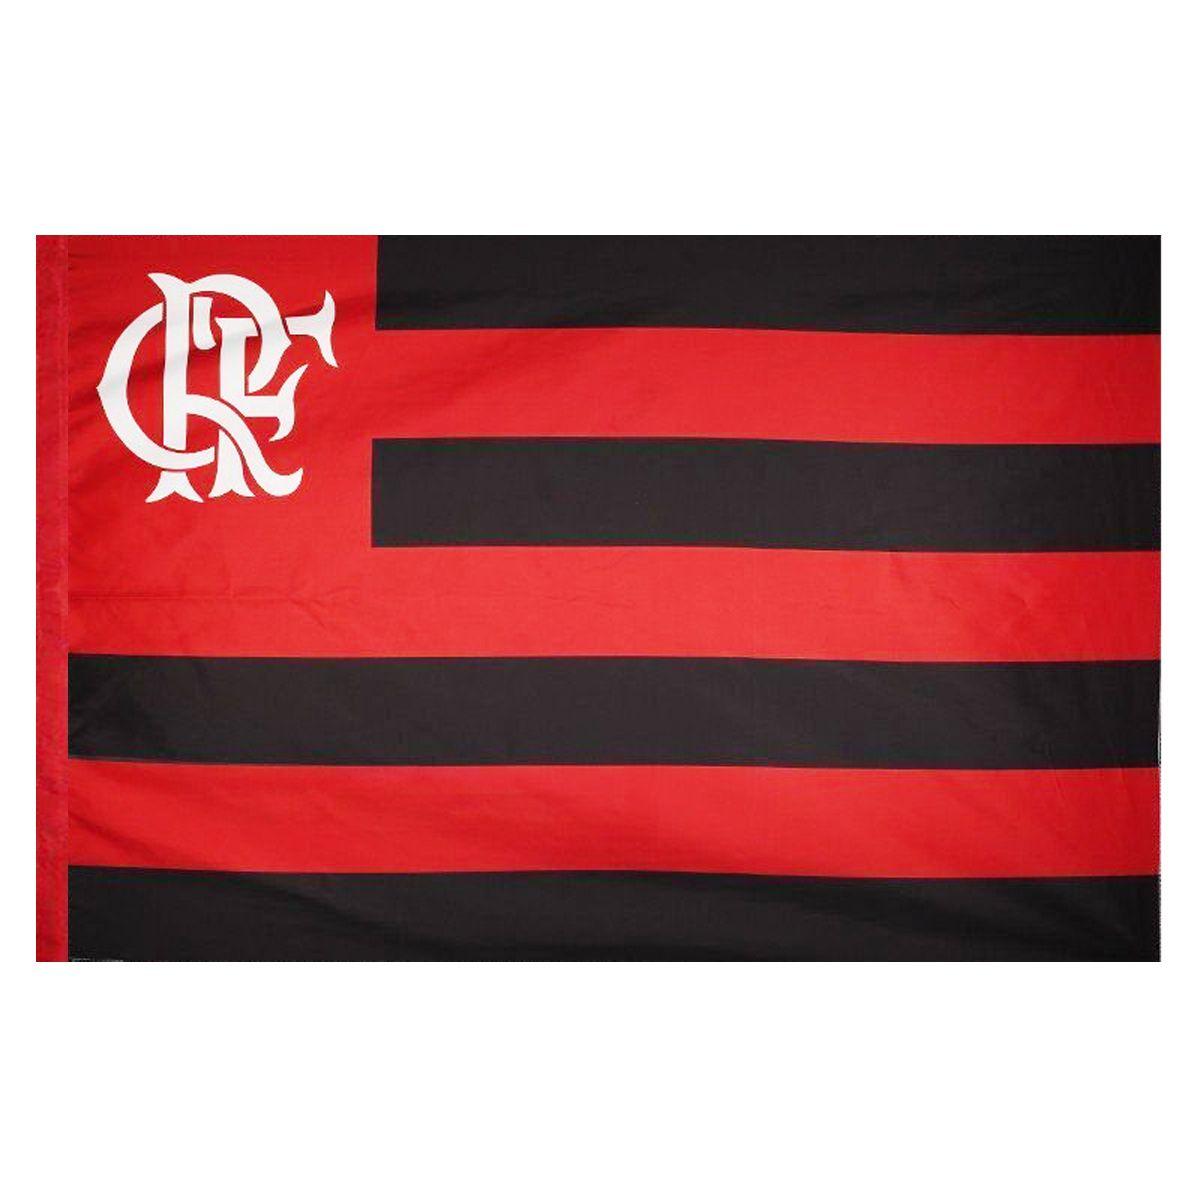 Bandeira Torcedor do Flamengo 96 x 68 cm - 1 1/2 pano